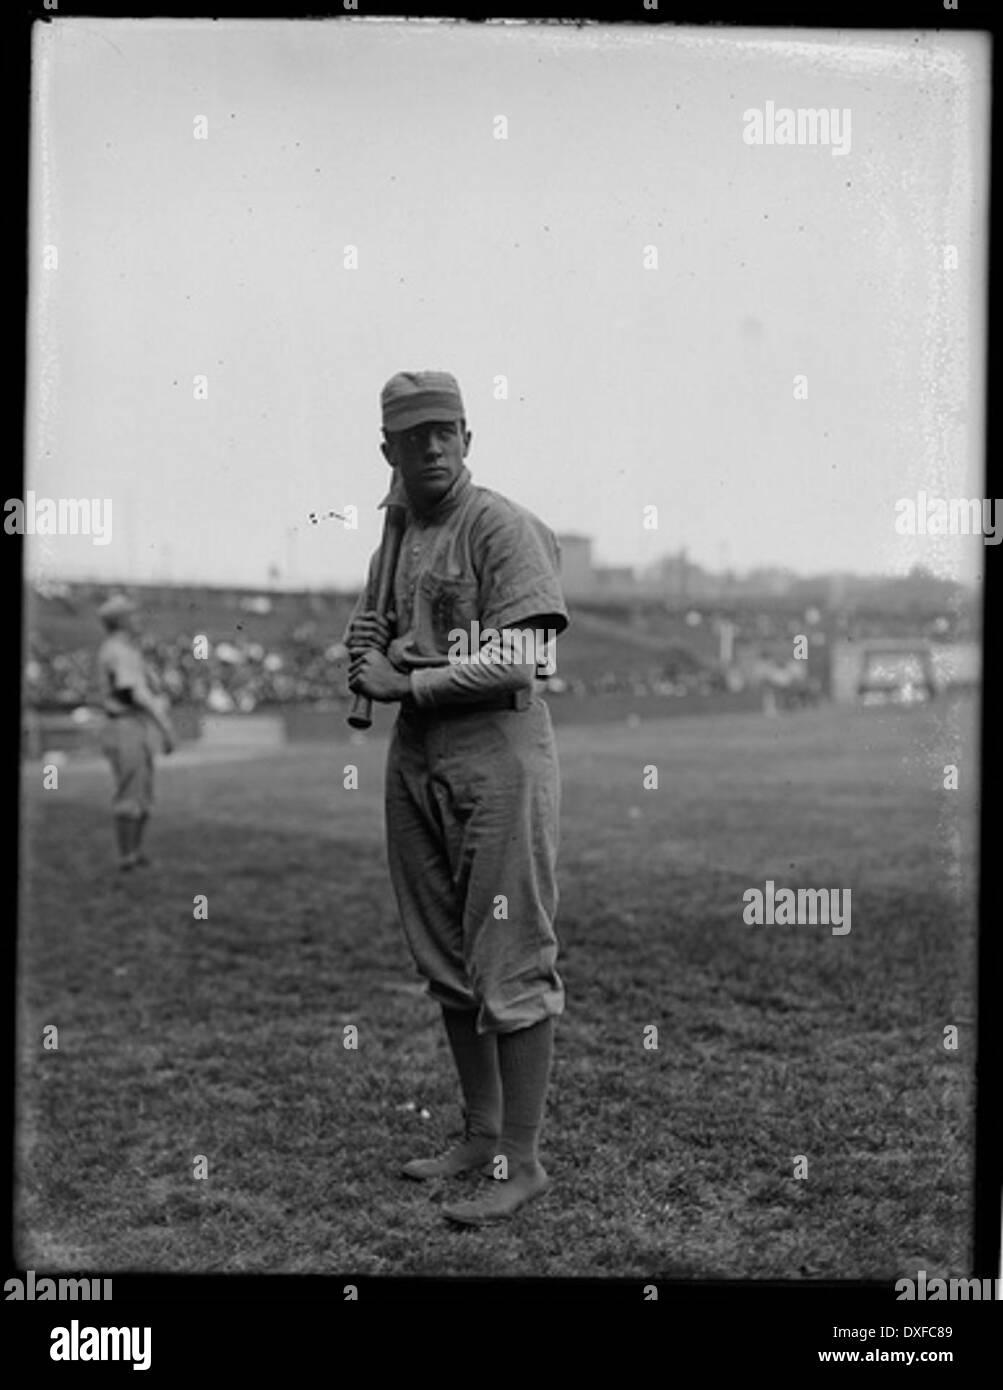 Portrait of Joe Tinker, baseball player - Stock Image